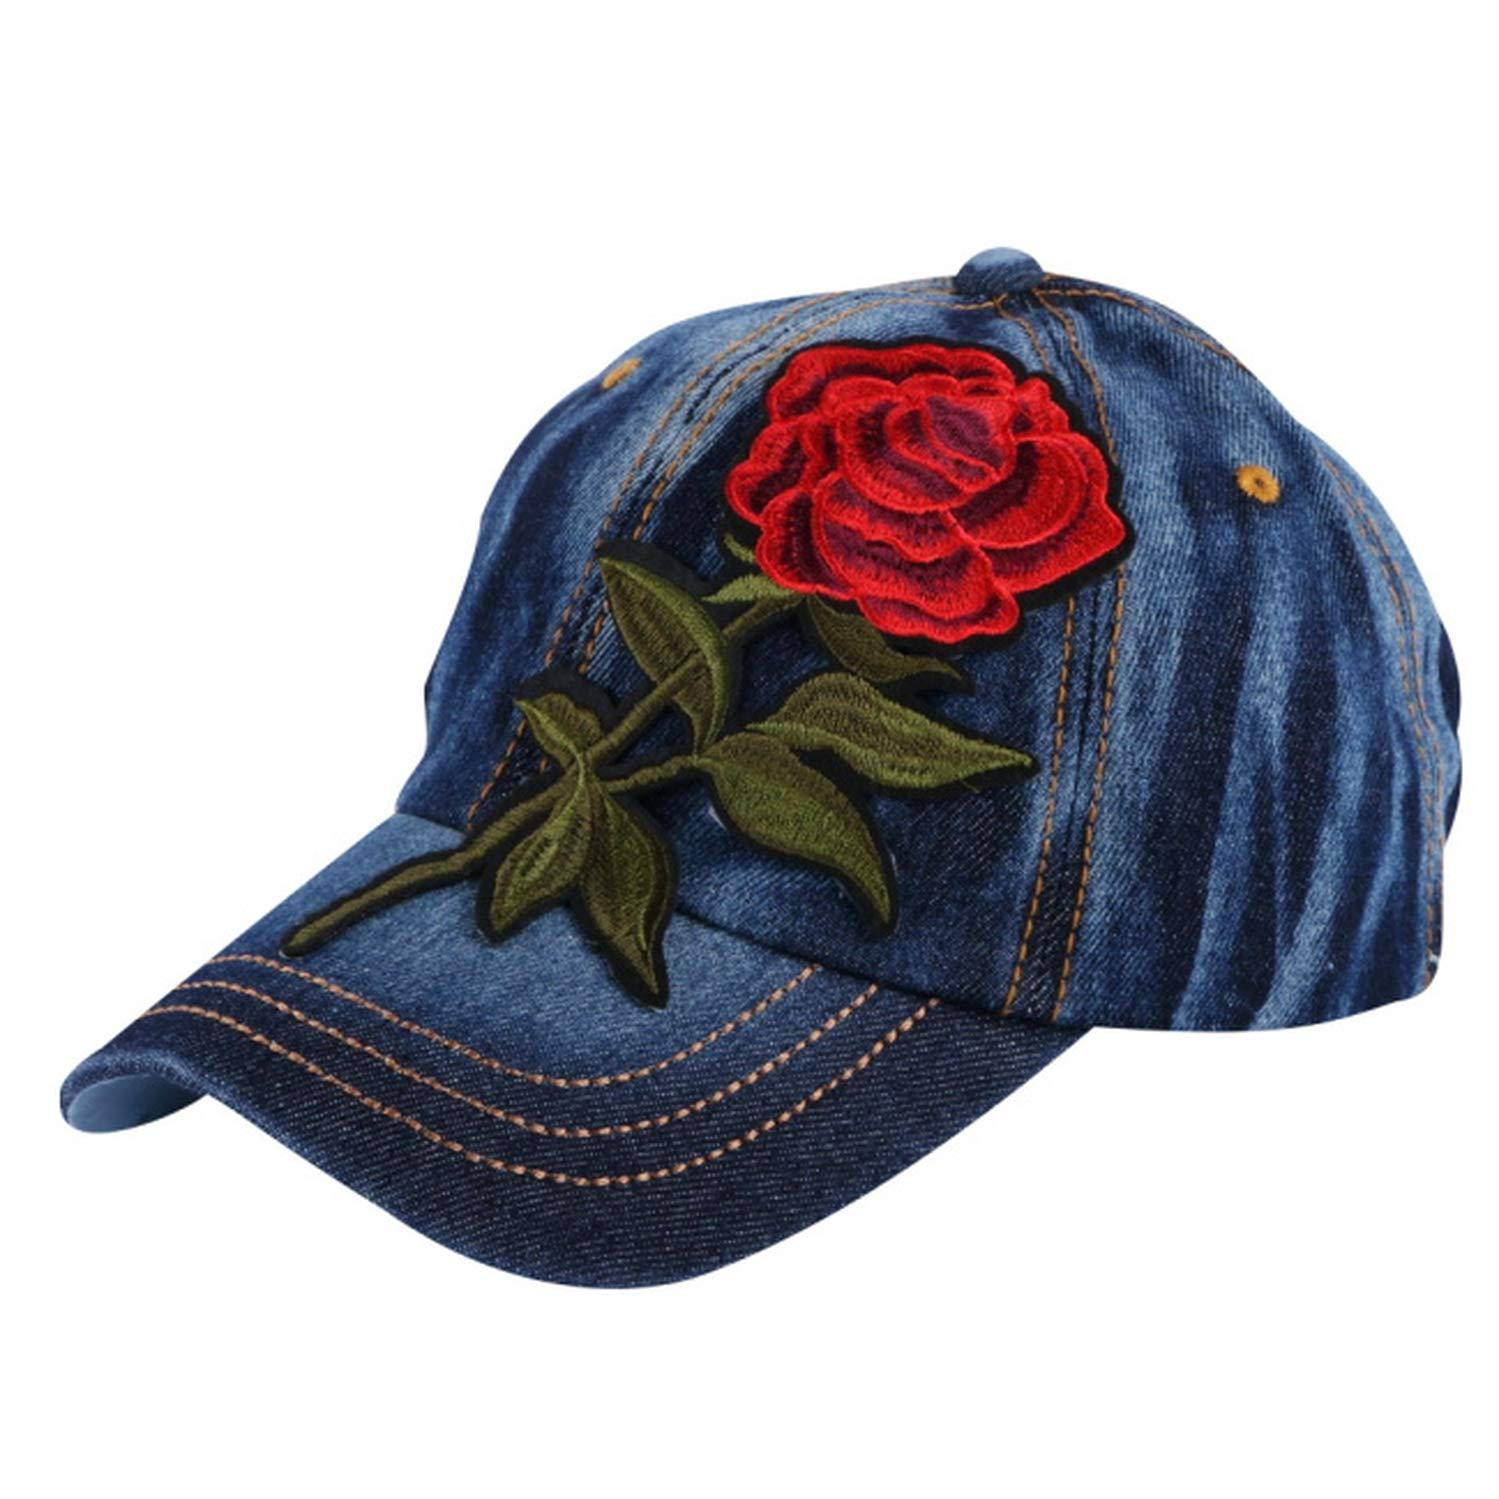 Trendy Women Girl Beauty Baseball Cap Rose Floral Design Hip hop Snapback hat Spring Summer Autumn hat